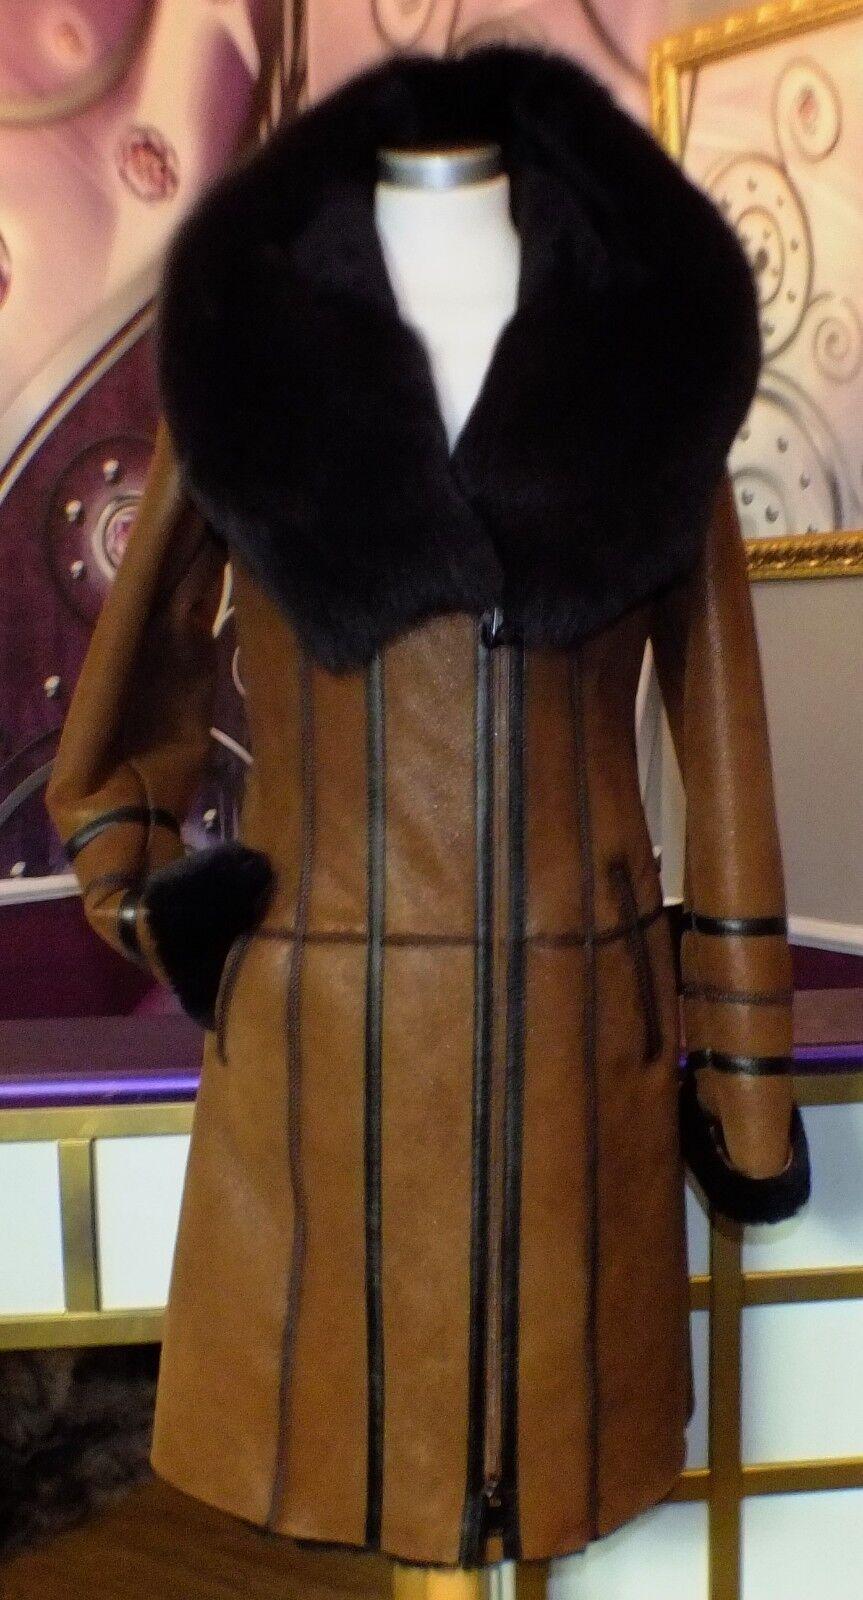 Luxus Designer Damen echter Lammfellmantel m m m  Toskana  Fell mit Kapuze Gr.38 NEU | Vorzugspreis  | Zürich  | Up-to-date Styling  | Großhandel  | Online Outlet Shop  9b68ef